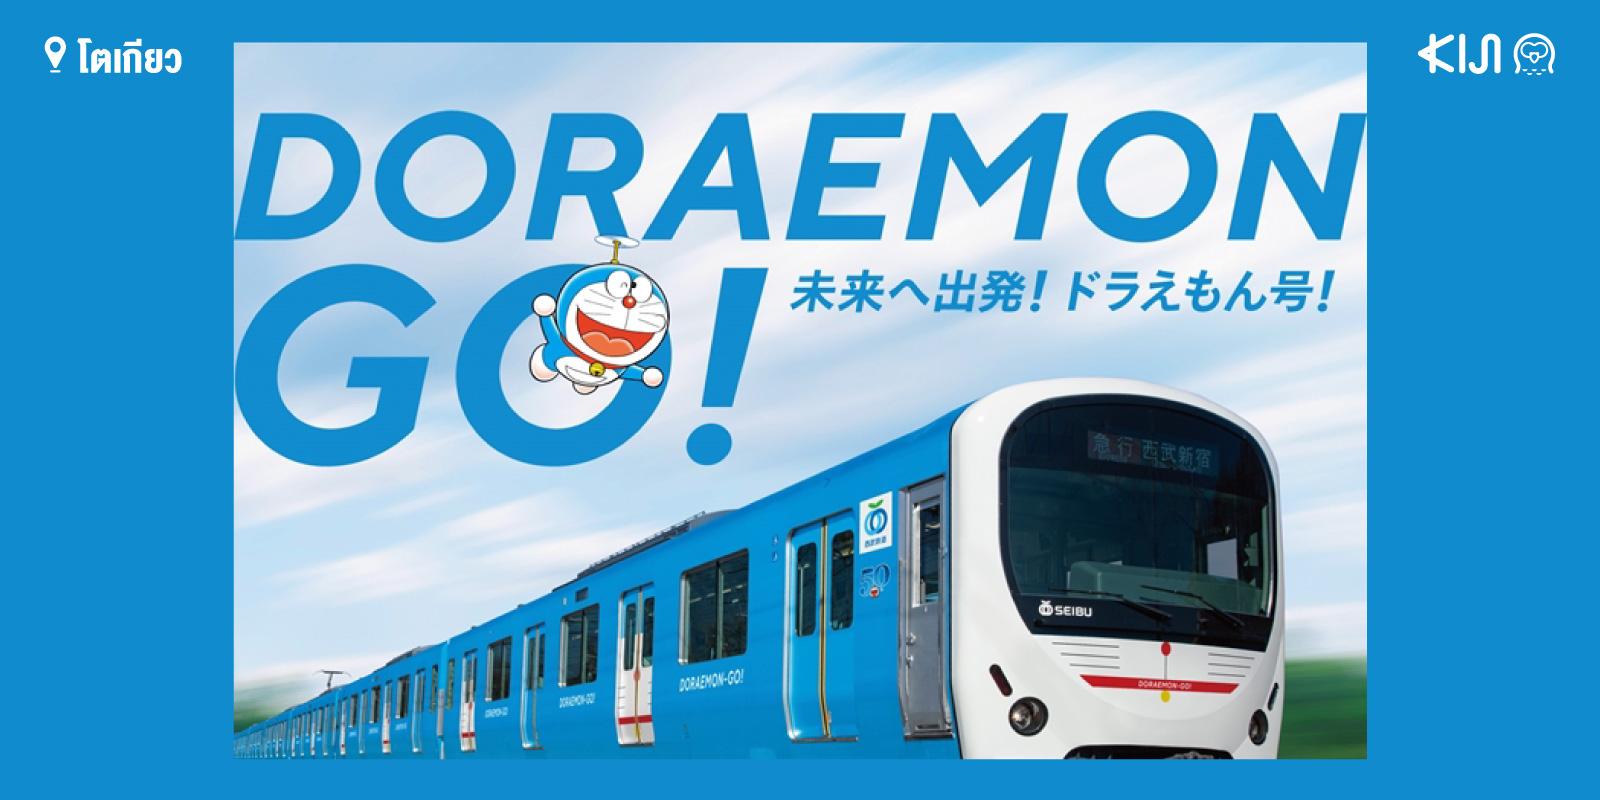 DORAEMON-GO รถไฟโดราเอมอน ญี่ปุ่น